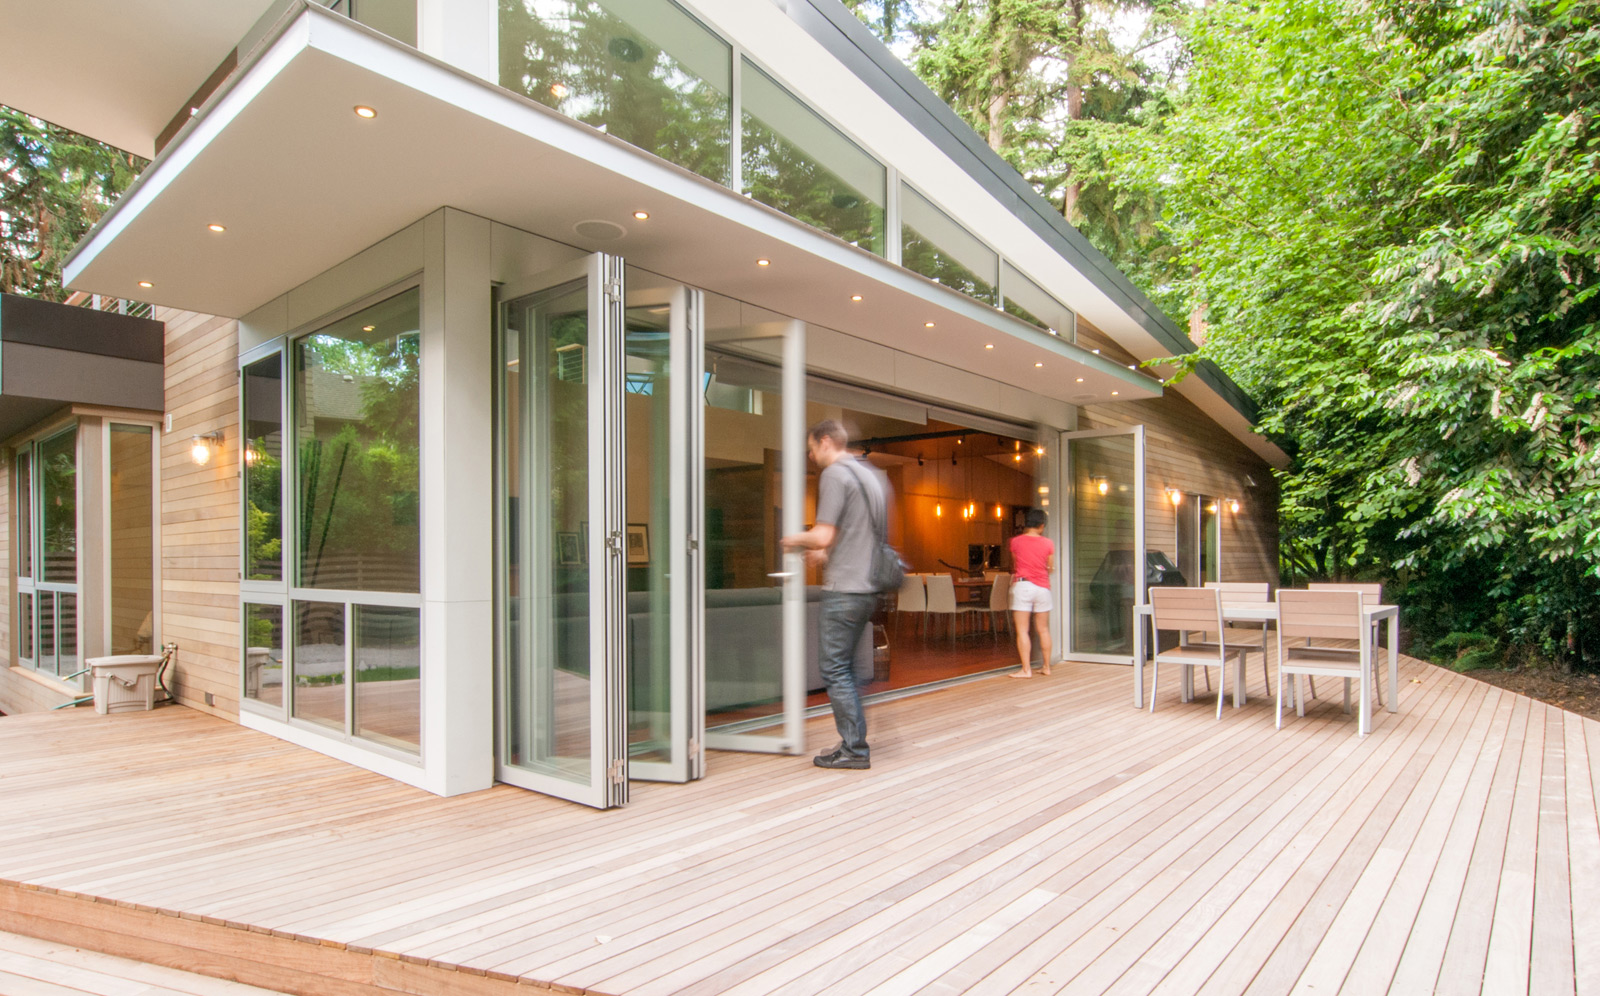 Making Accordion Glass Doors : 27. Accordion glass windows and doors make you feel like you're ...